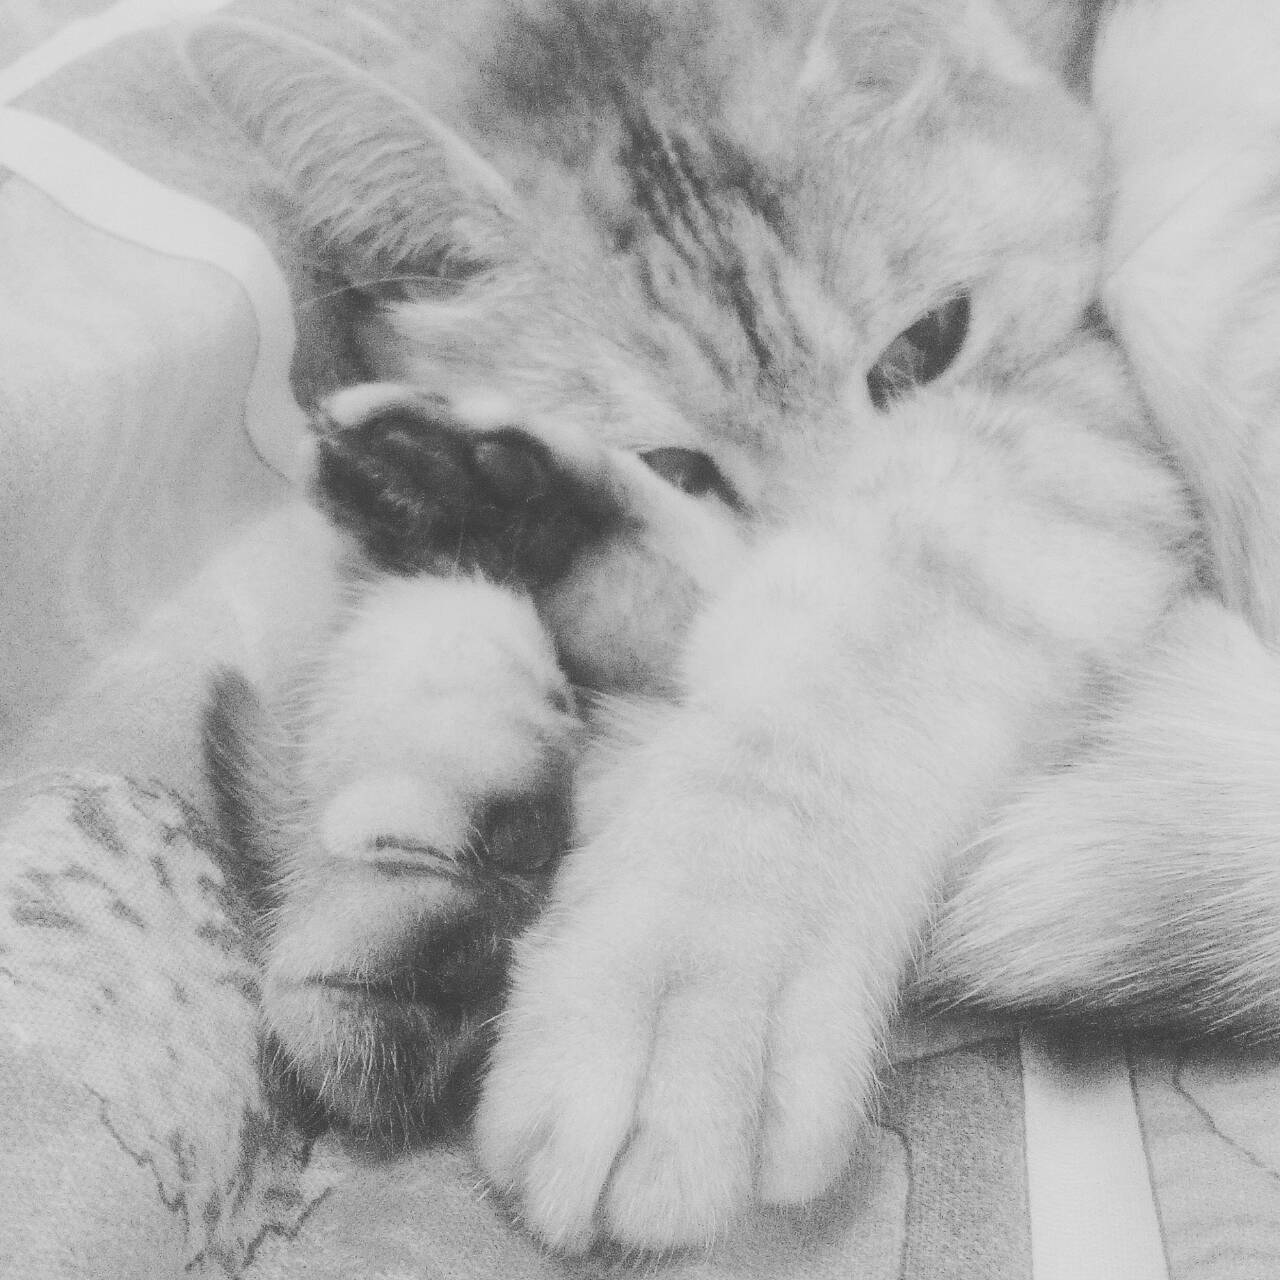 Шерстяная кошка